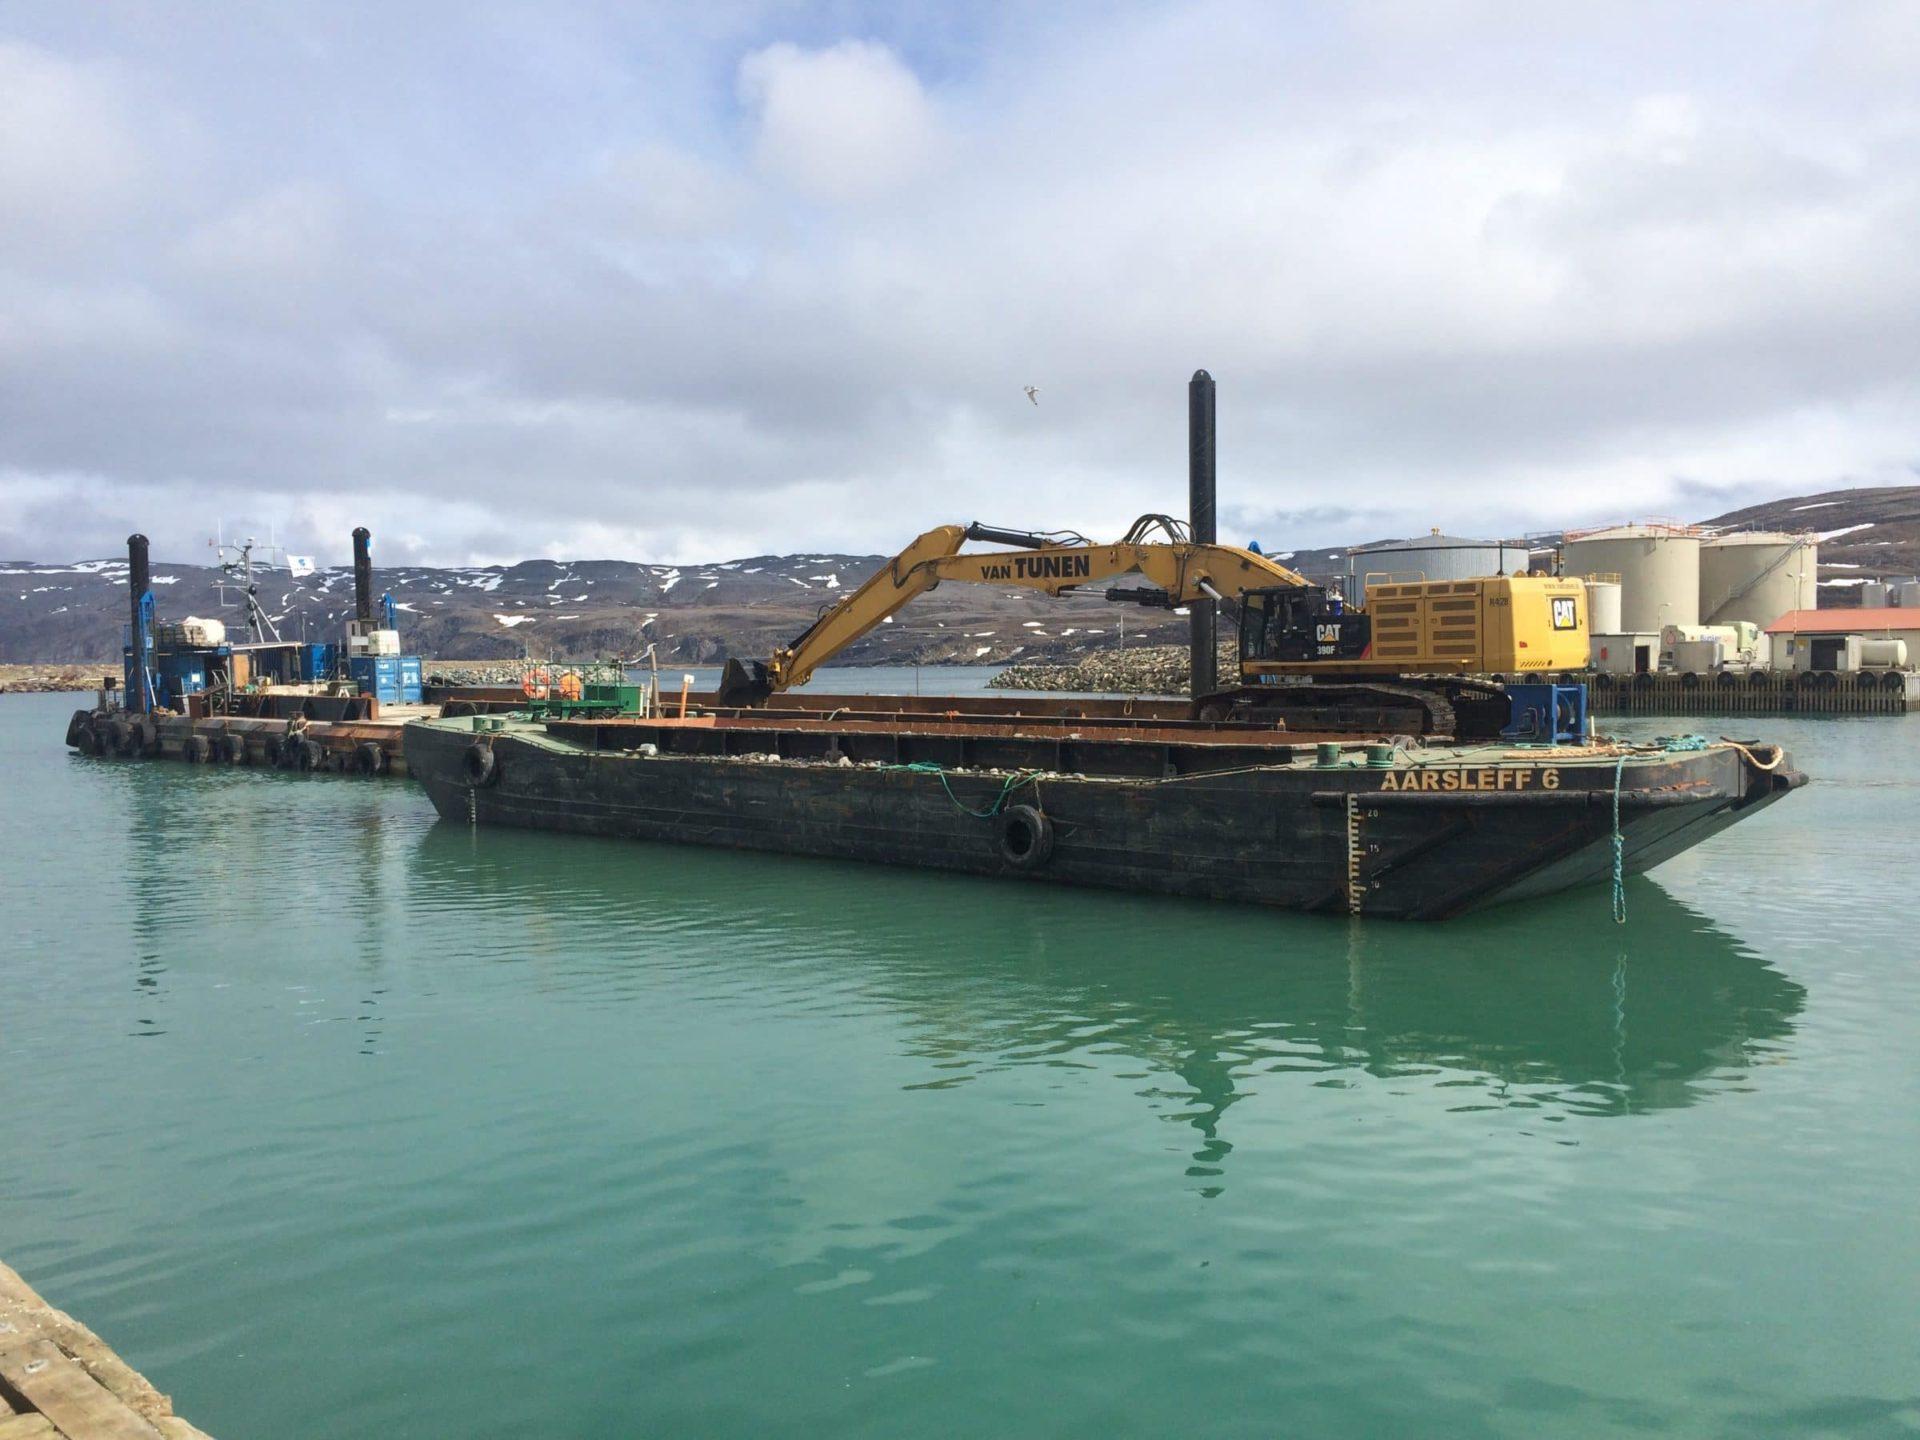 06/2018 Harbour excavation from pontoon, Båtsfjord Norway